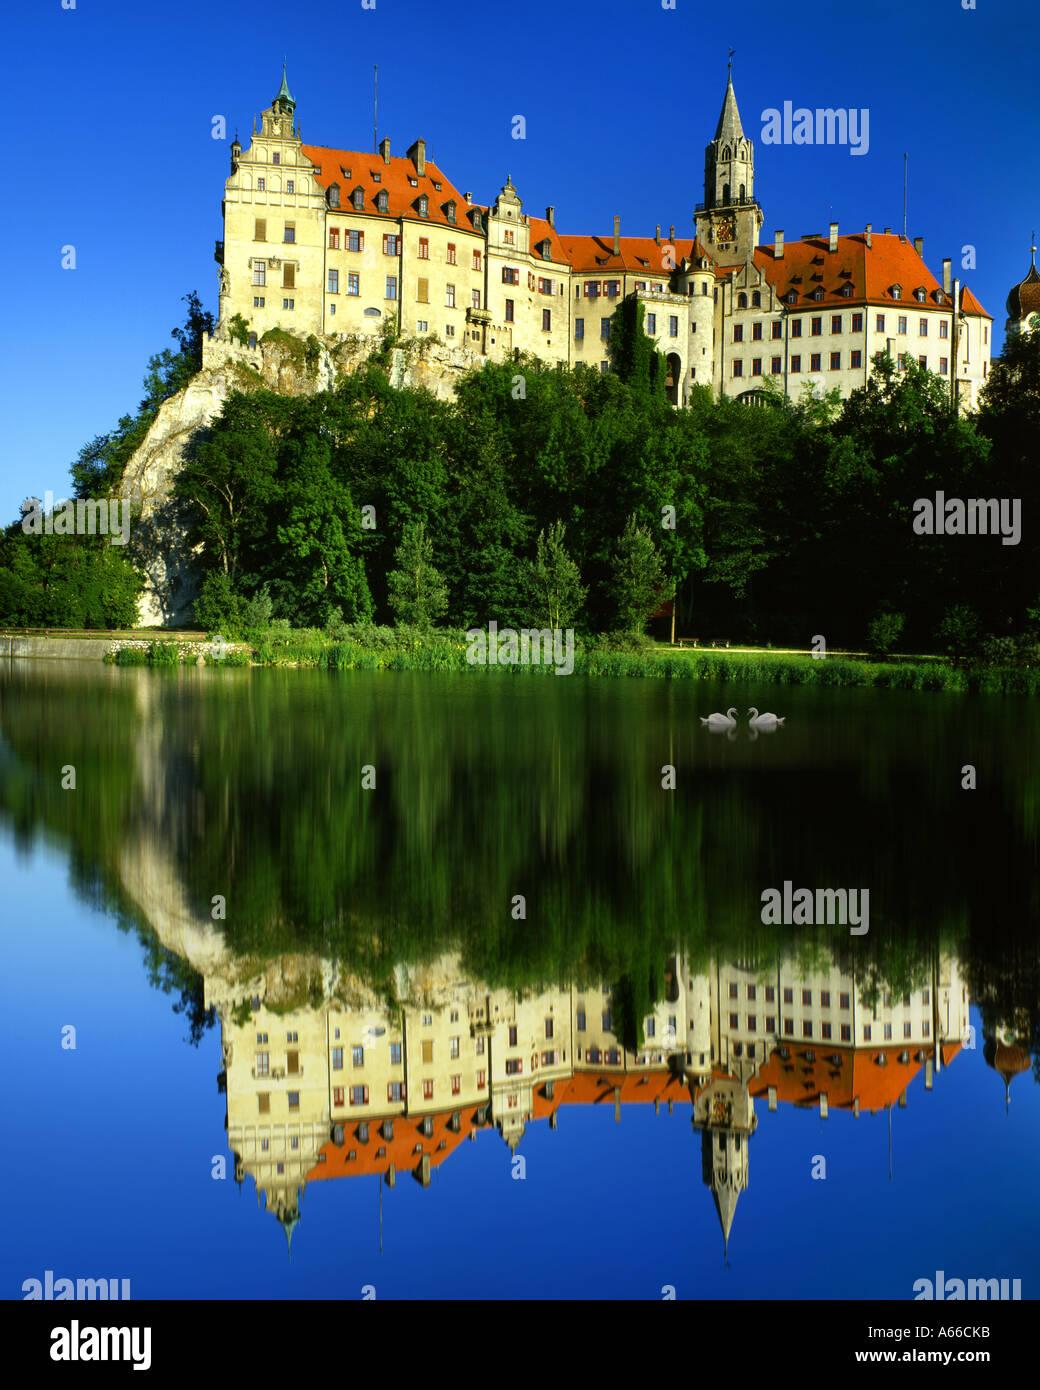 DE - BADEN WUERTTEMBERG:  Hohenzollern Castle at Sigmaringen and River Danube - Stock Image